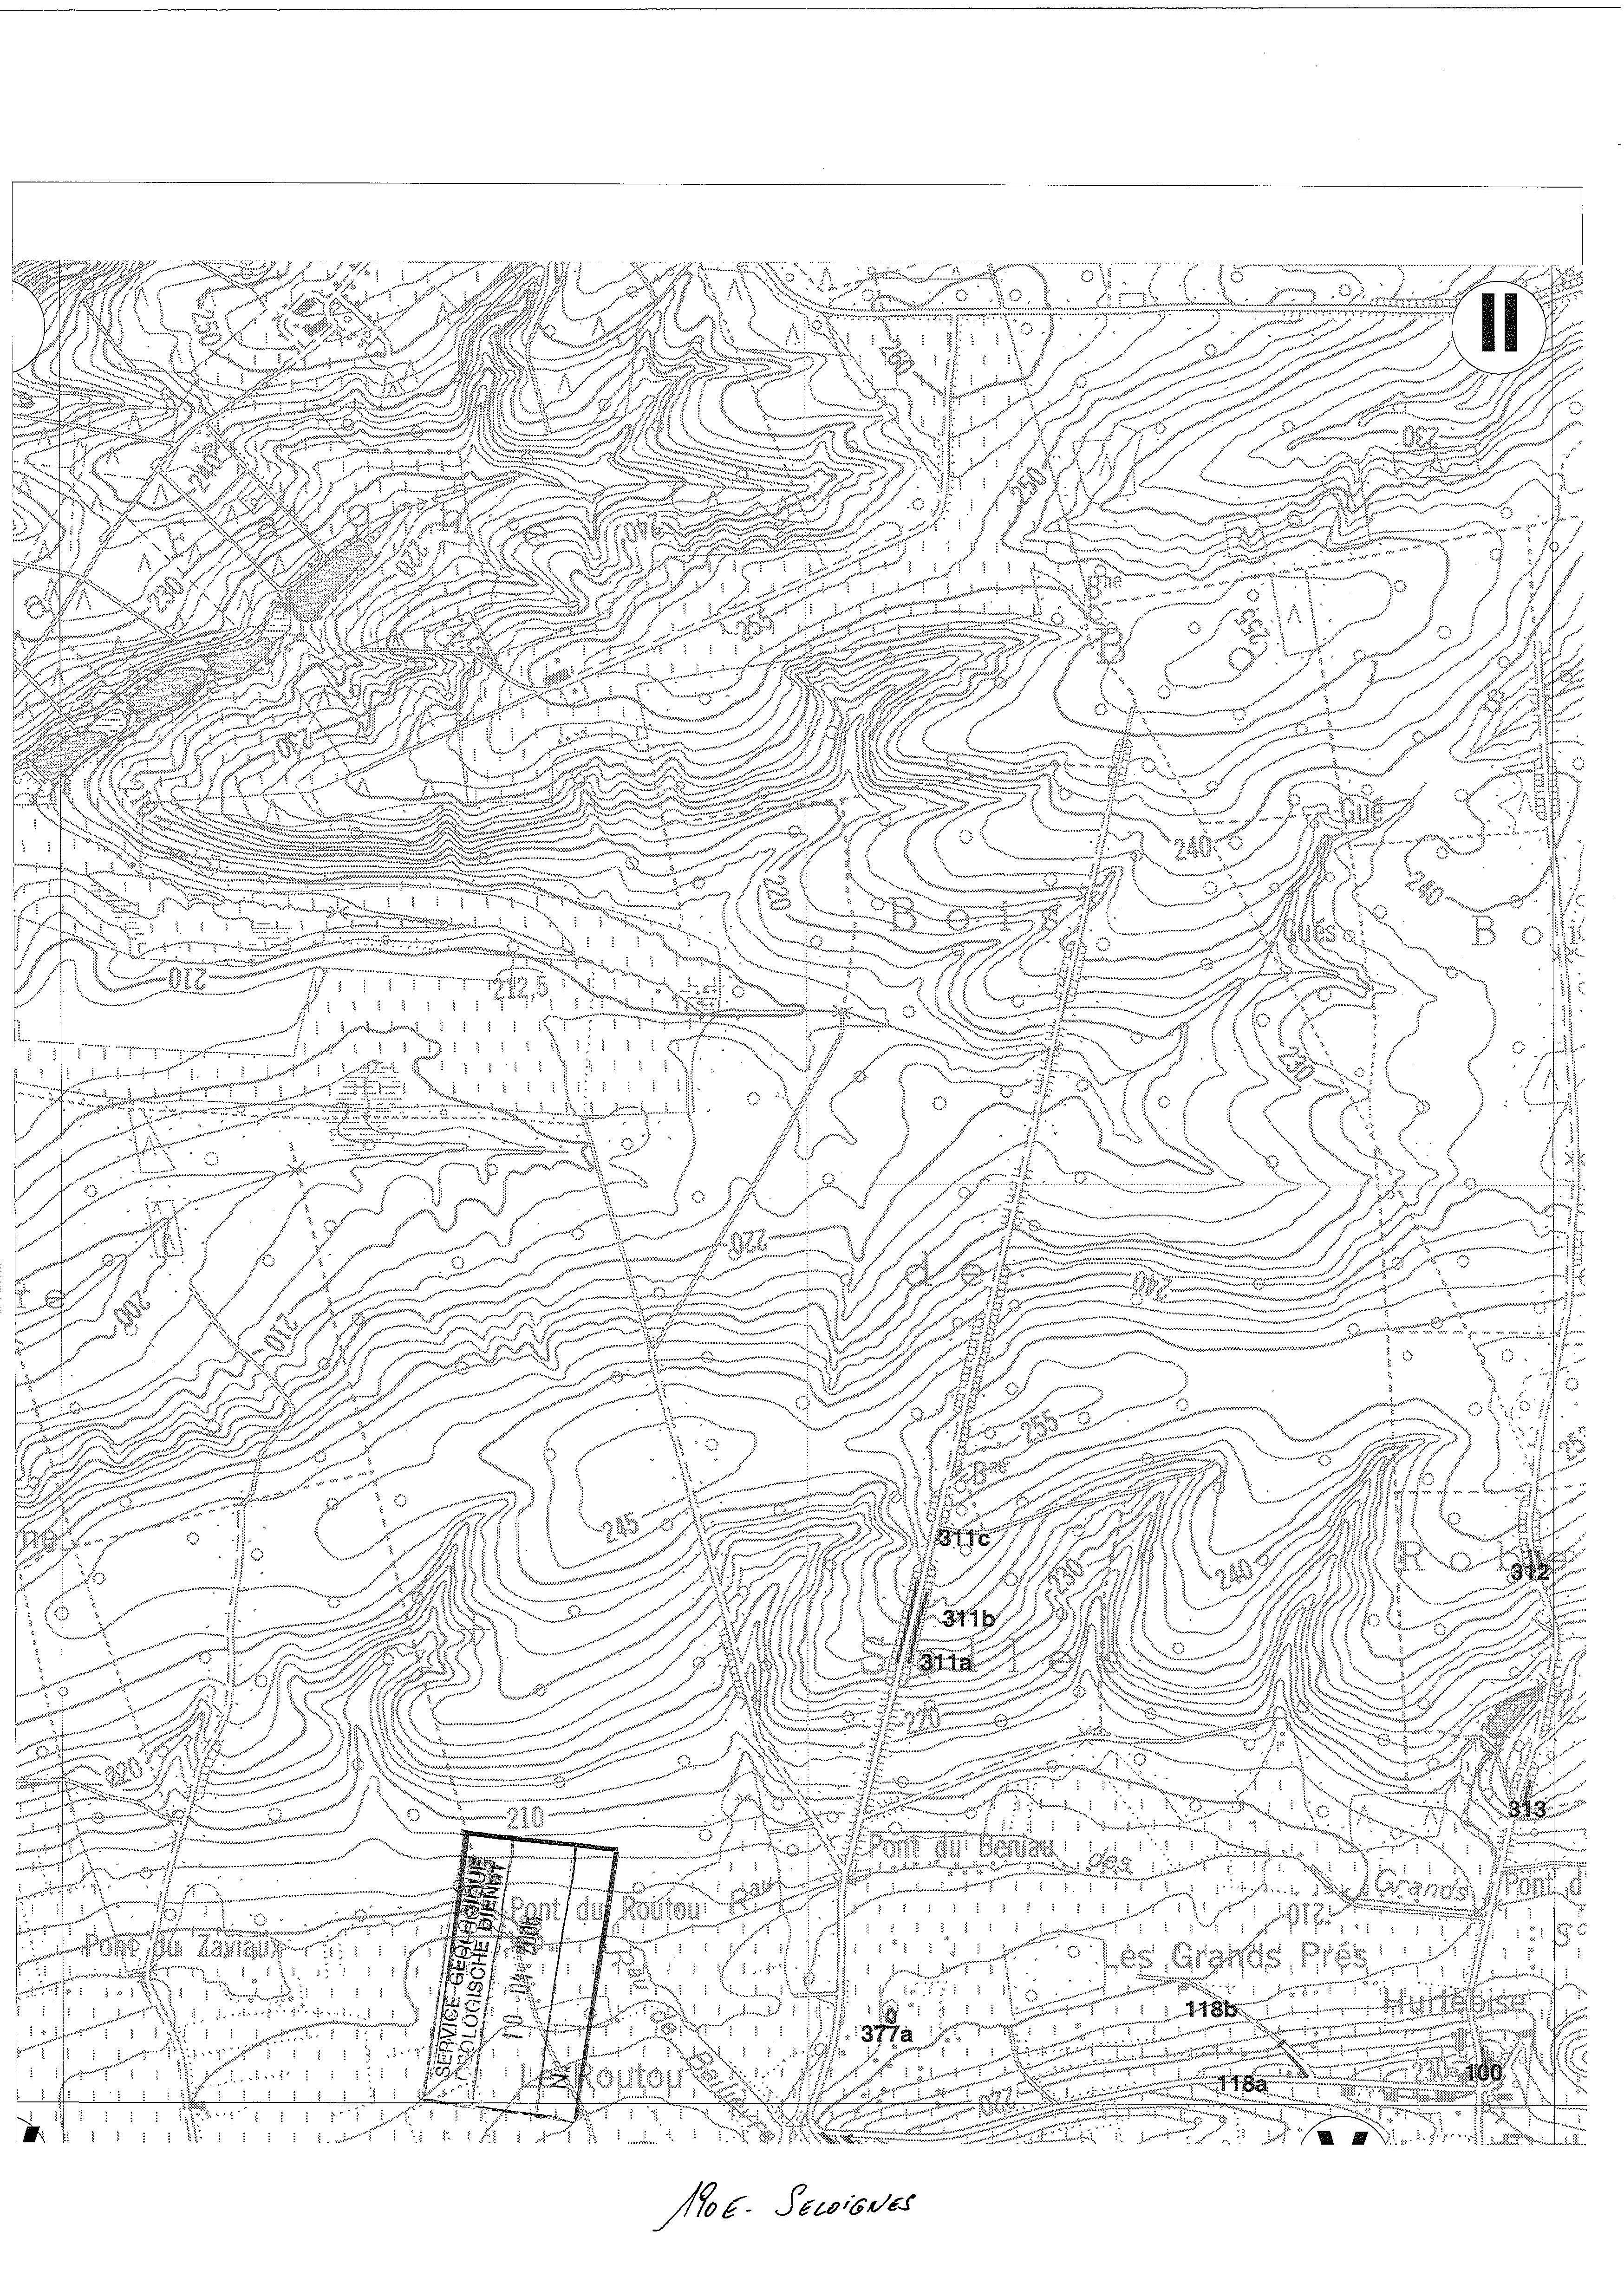 190E_Seloignes_Page_2_Image_0001.jpg